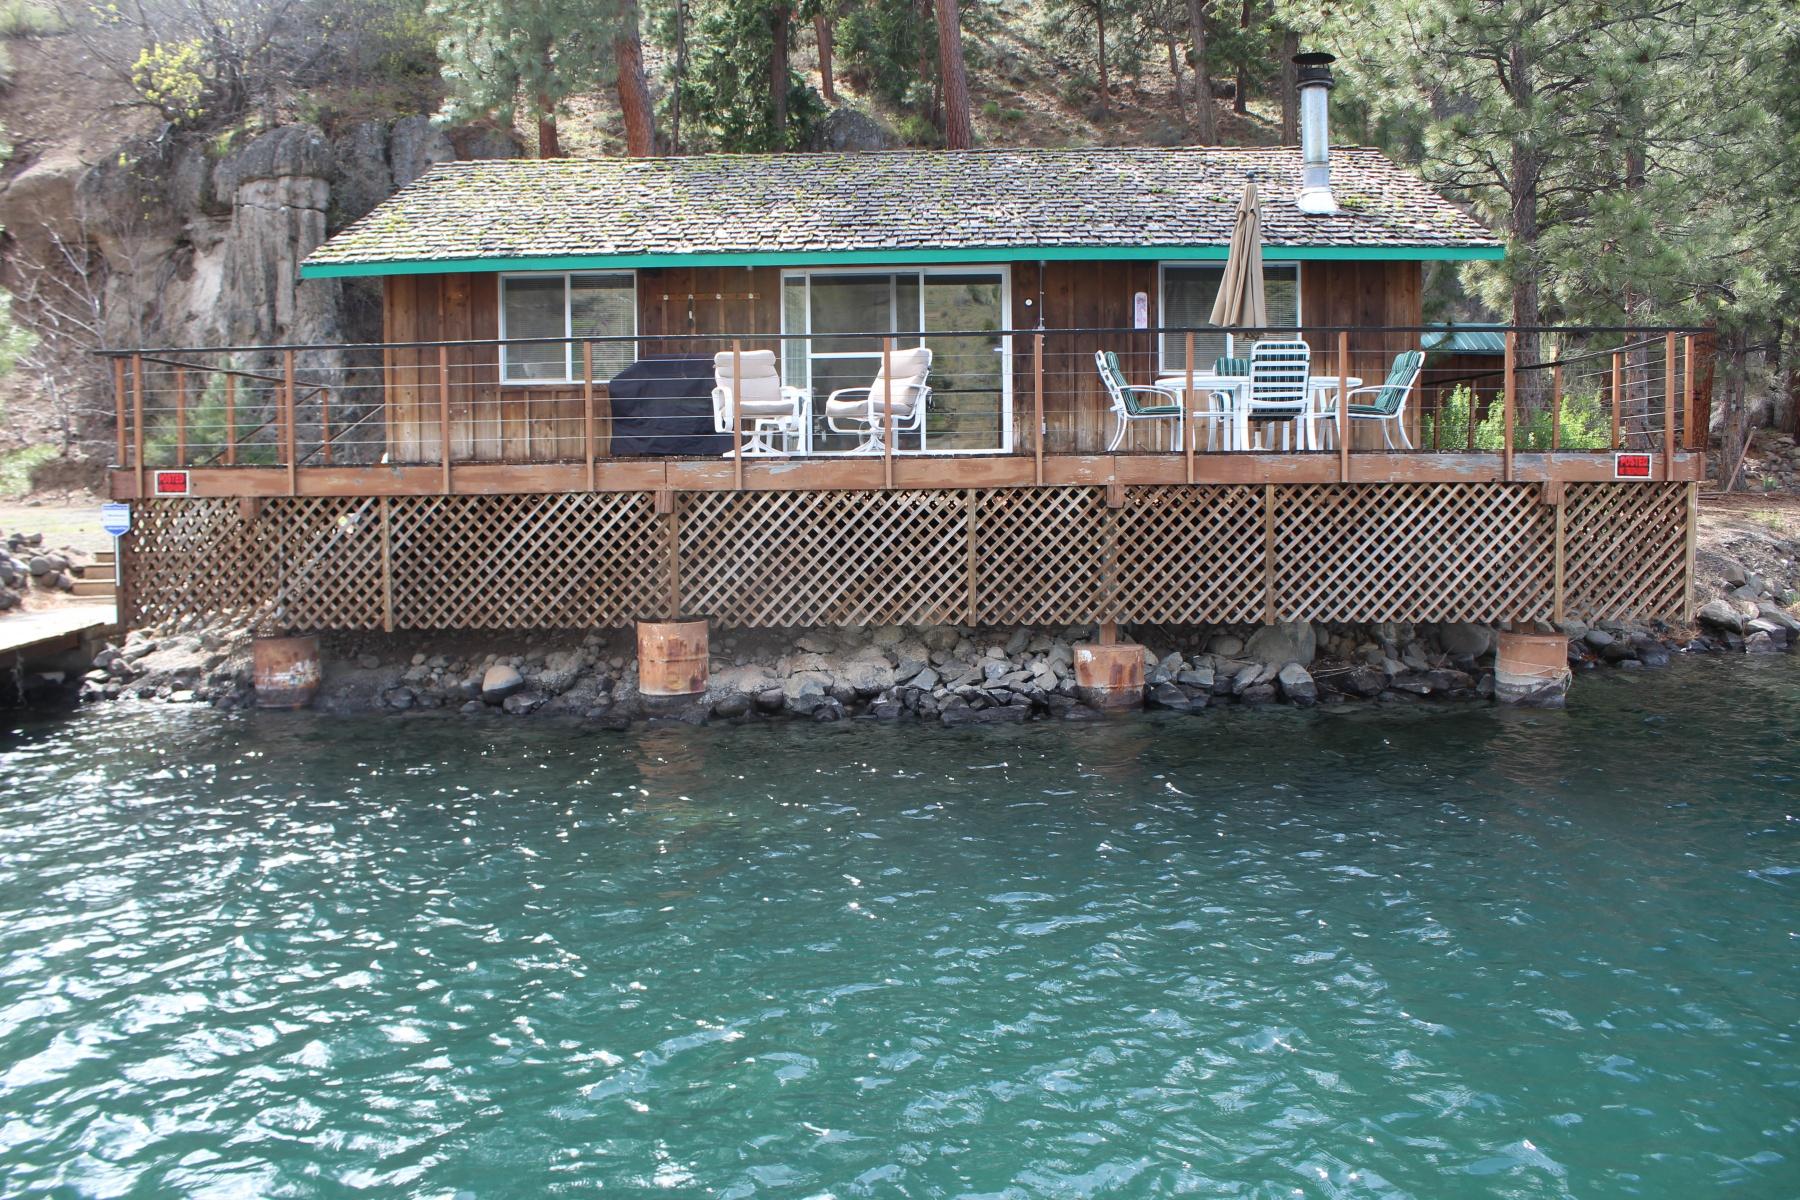 独户住宅 为 销售 在 Lake Front Cabin - 85% Share 2900 SW Street Crk 卡尔弗, 俄勒冈州, 97734 美国